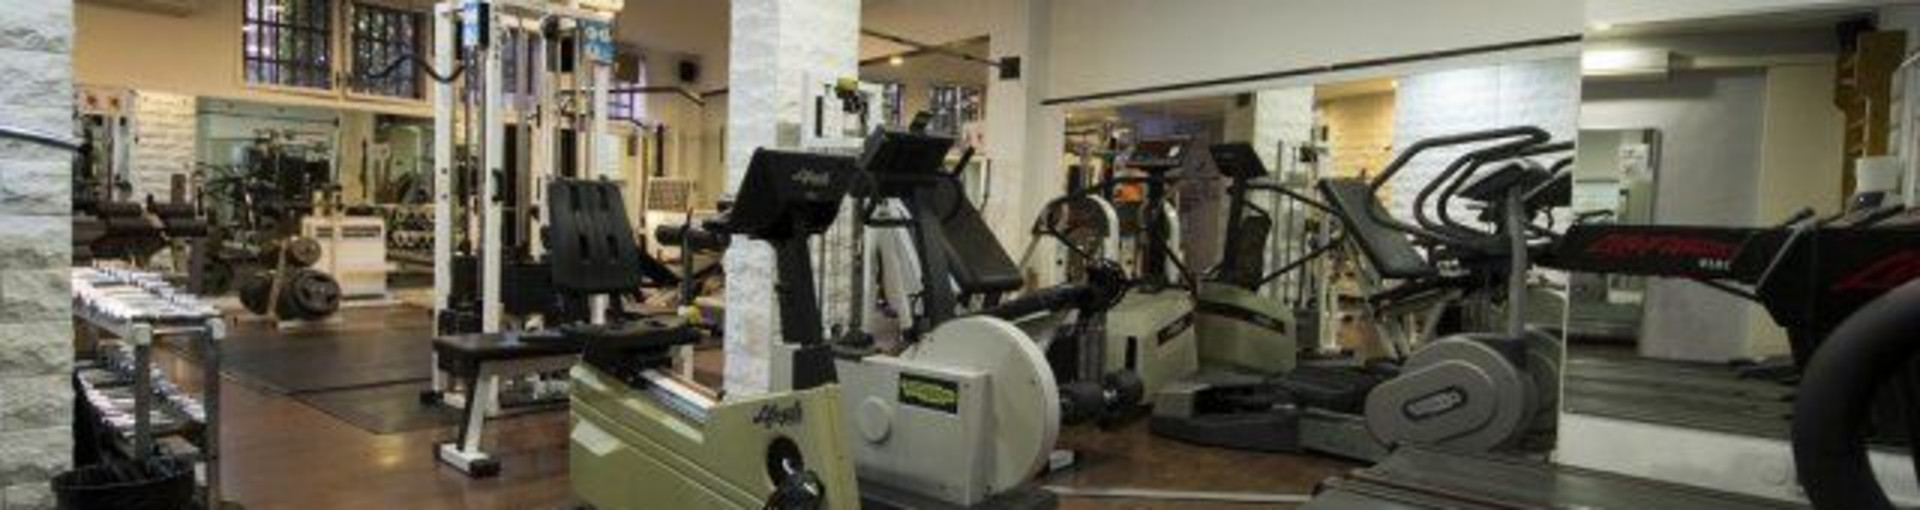 New Gymnika Fitness - Milano